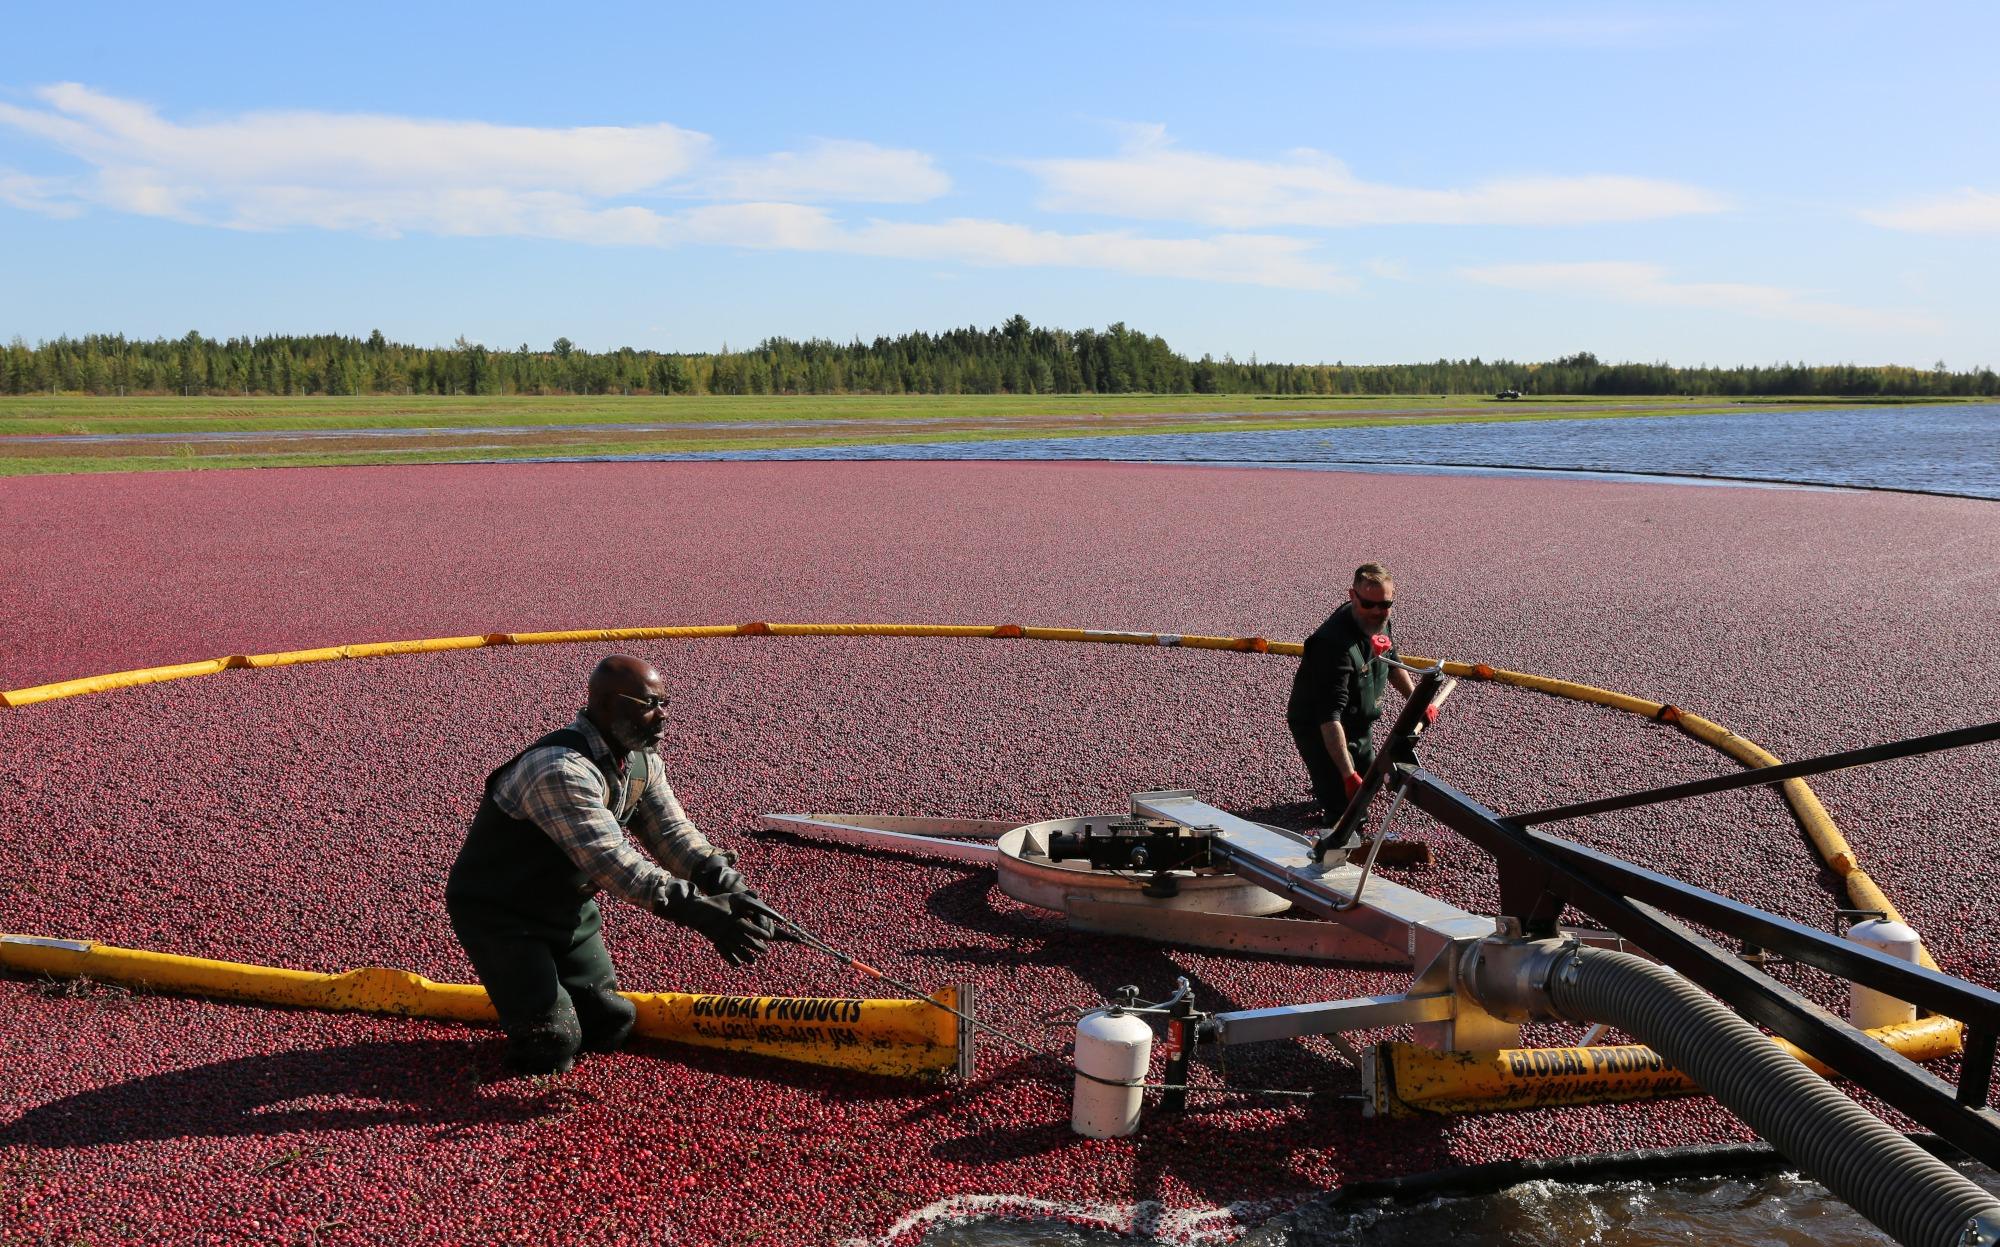 Cranberry Harvest Tour At Lake Nokomis Cranberries Vilas County Wisconsin